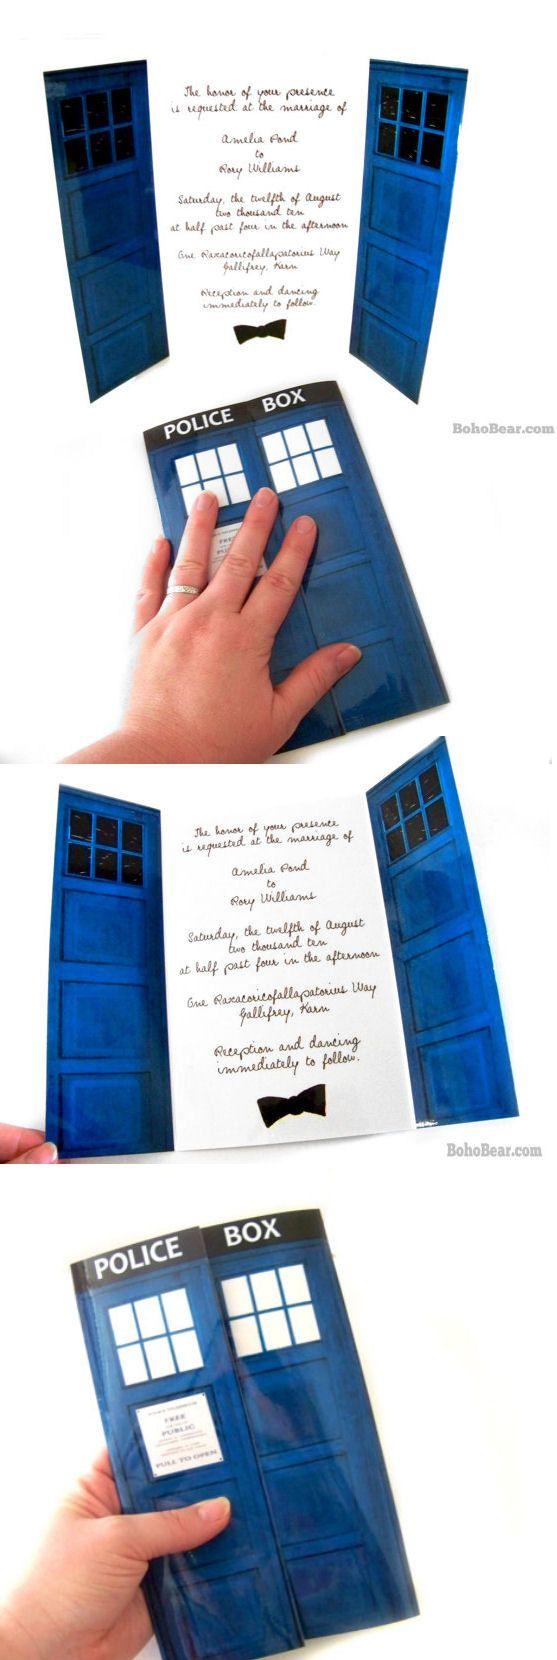 Doctor Who Inspired Wedding Invitations, Blue Police Box Invites for Geek Weddings: Fandom Wedding, Wedding Ideas, Doctor Who Wedding Idea, Doctor Who Wedding Invitation, Geek Weddings, Geeky Wedding, Geek Wedding Invitations